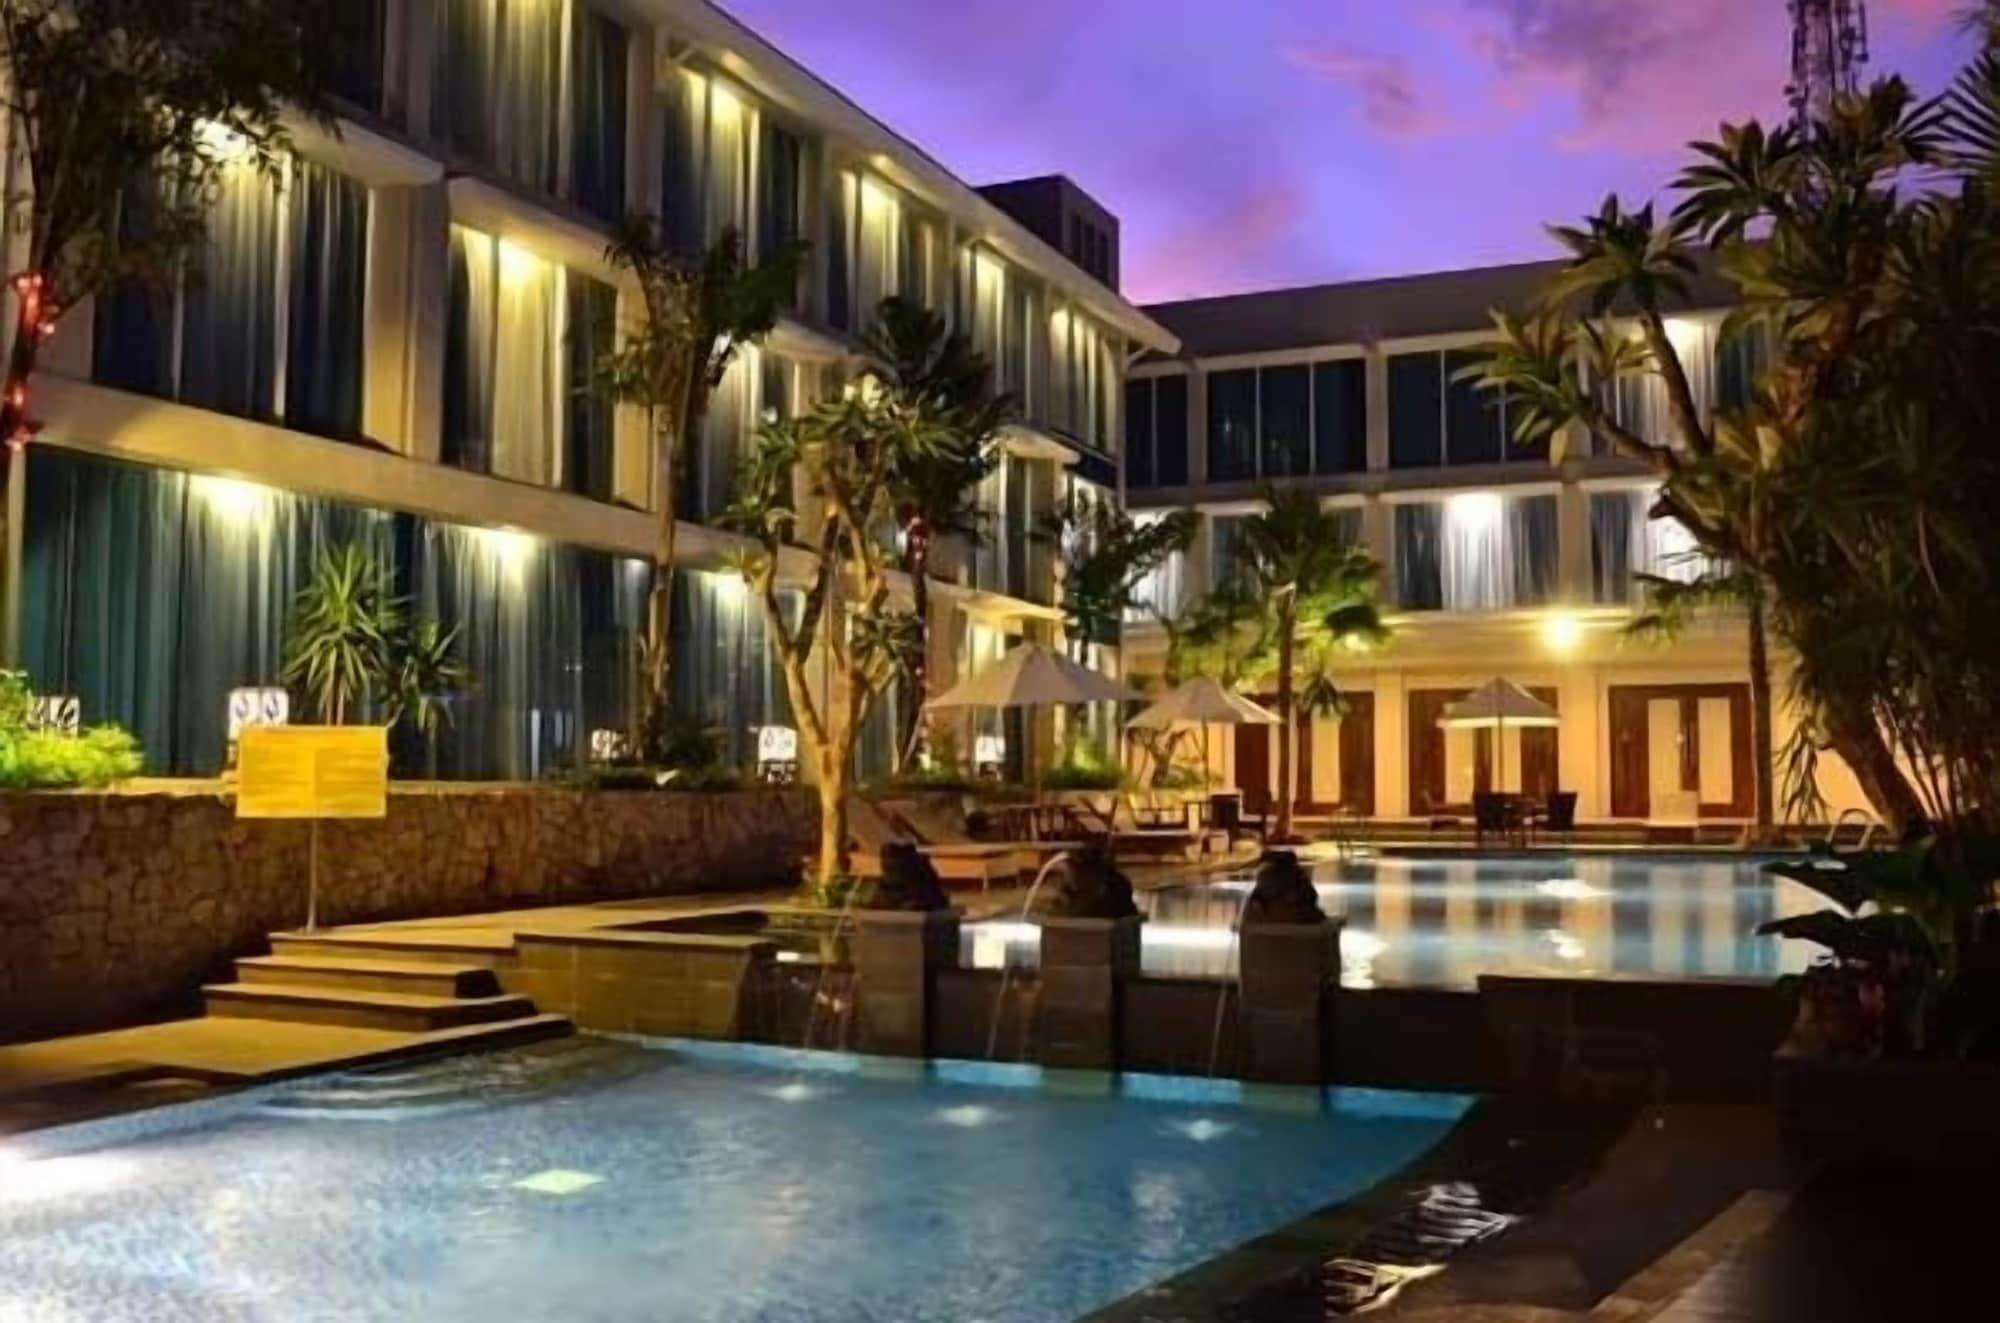 Emersia Hotel & Resort, Bandar Lampung